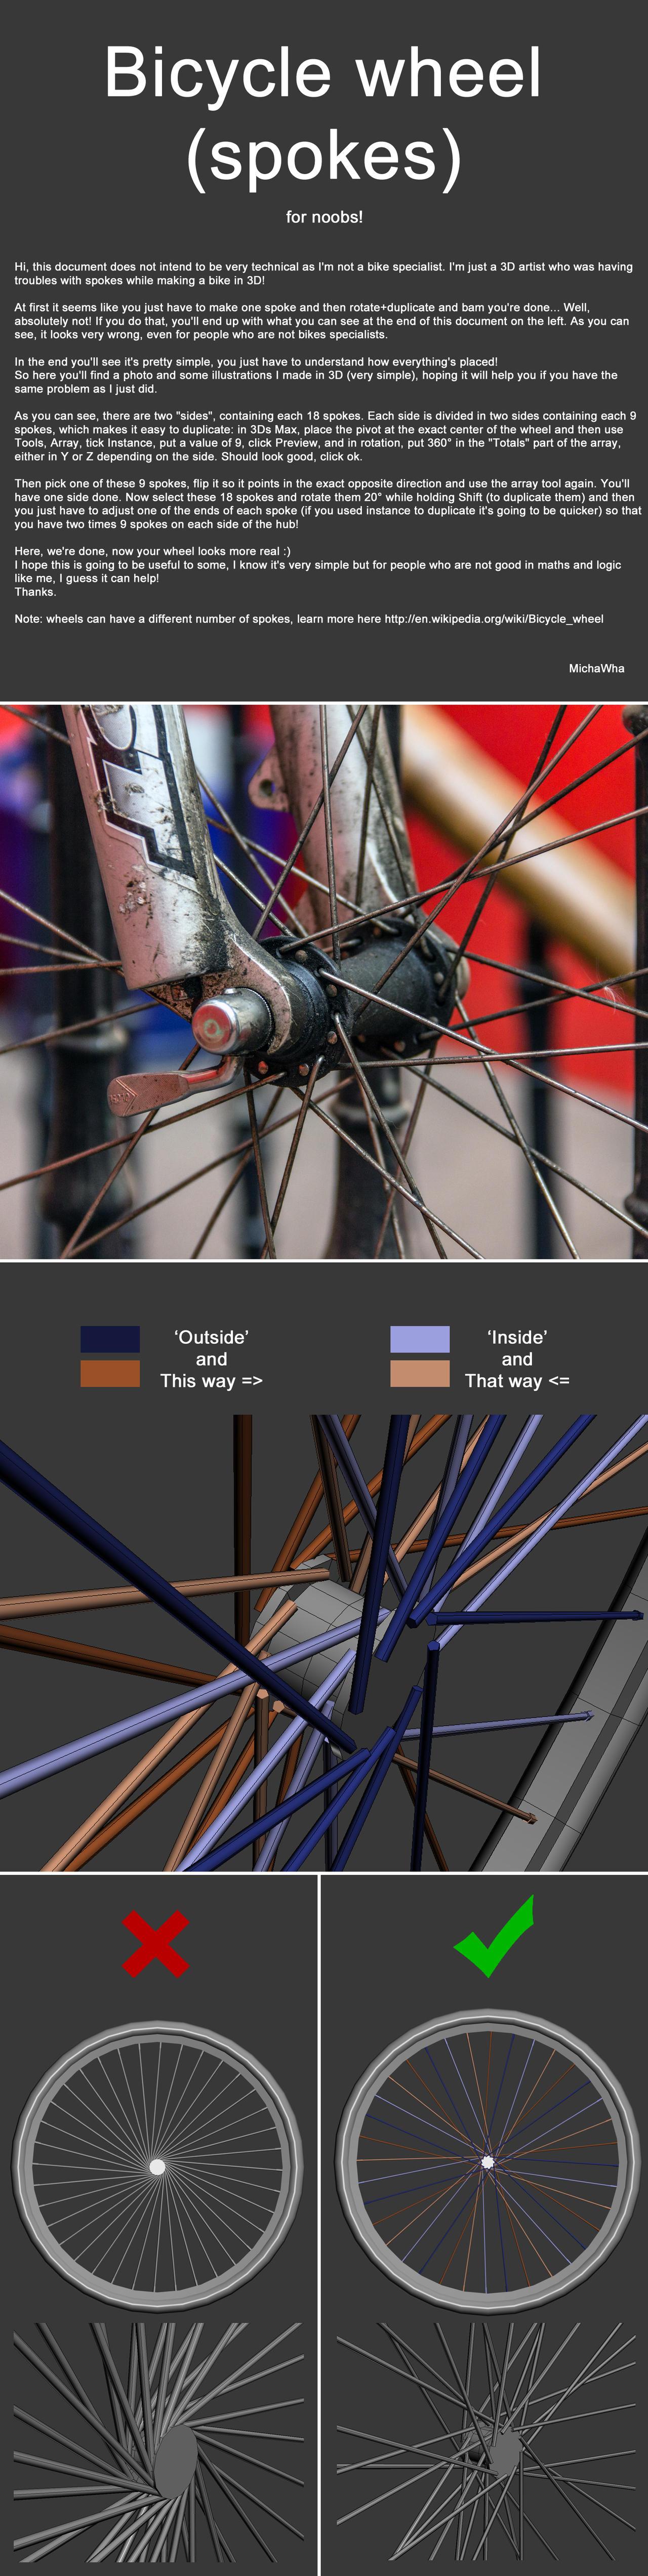 Tutorial: bike wheels - spokes by MichaWha